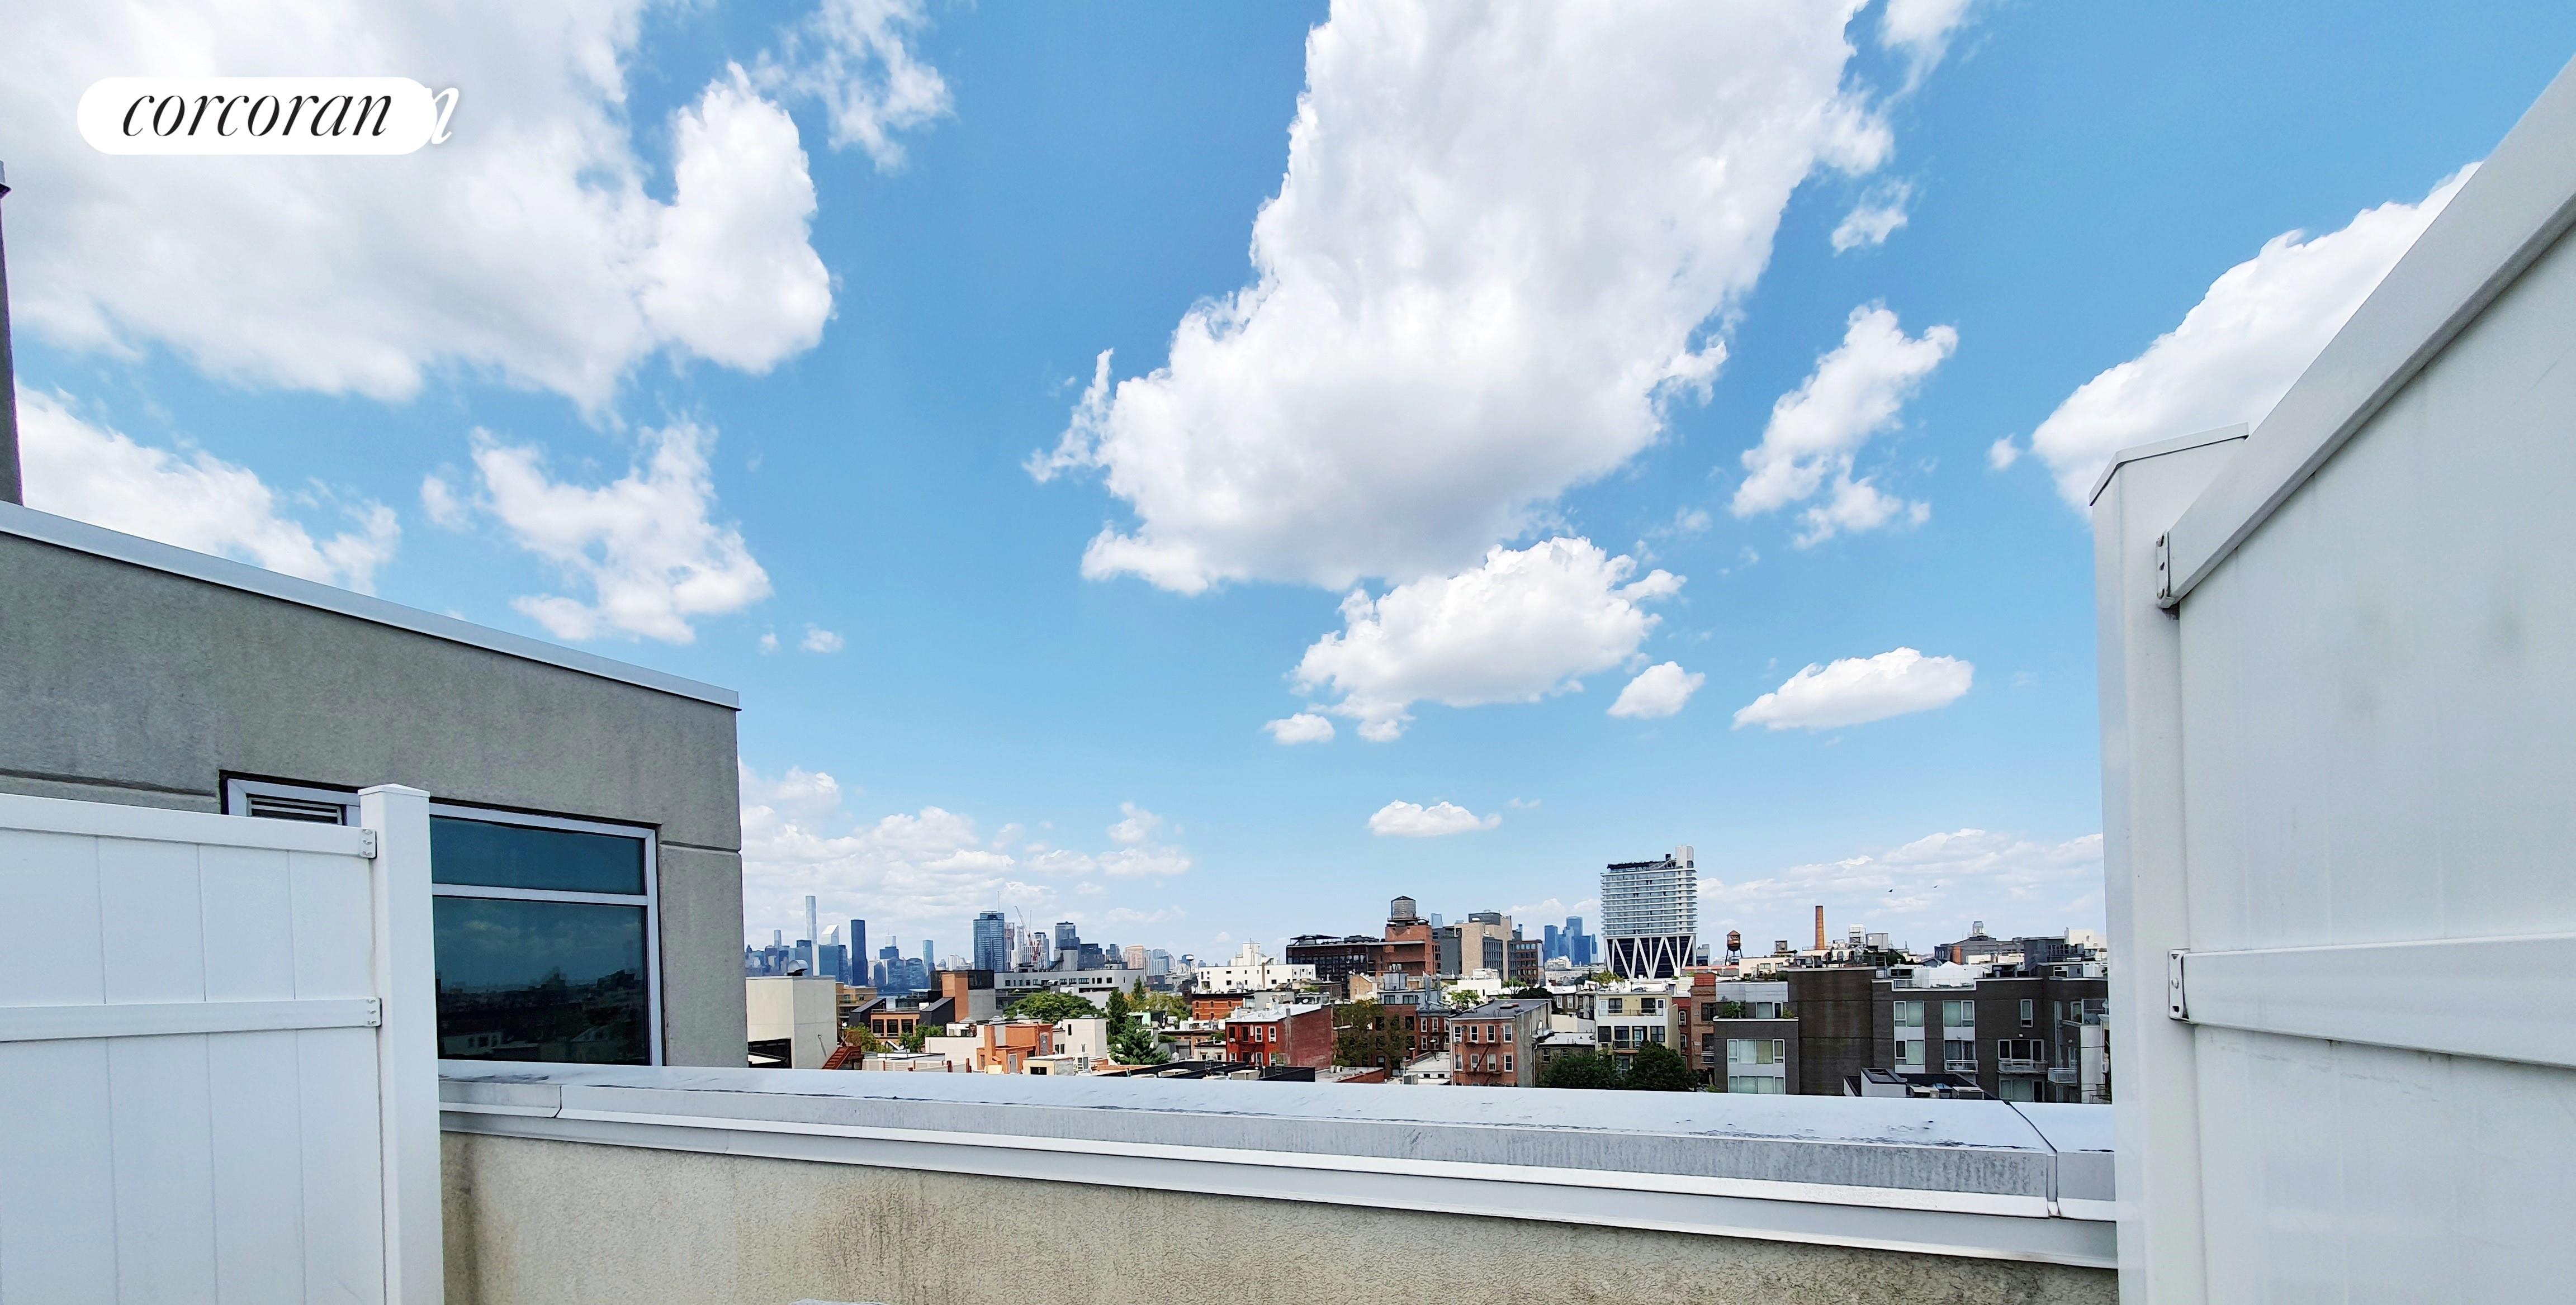 101 North 5th Street Williamsburg Brooklyn NY 11249